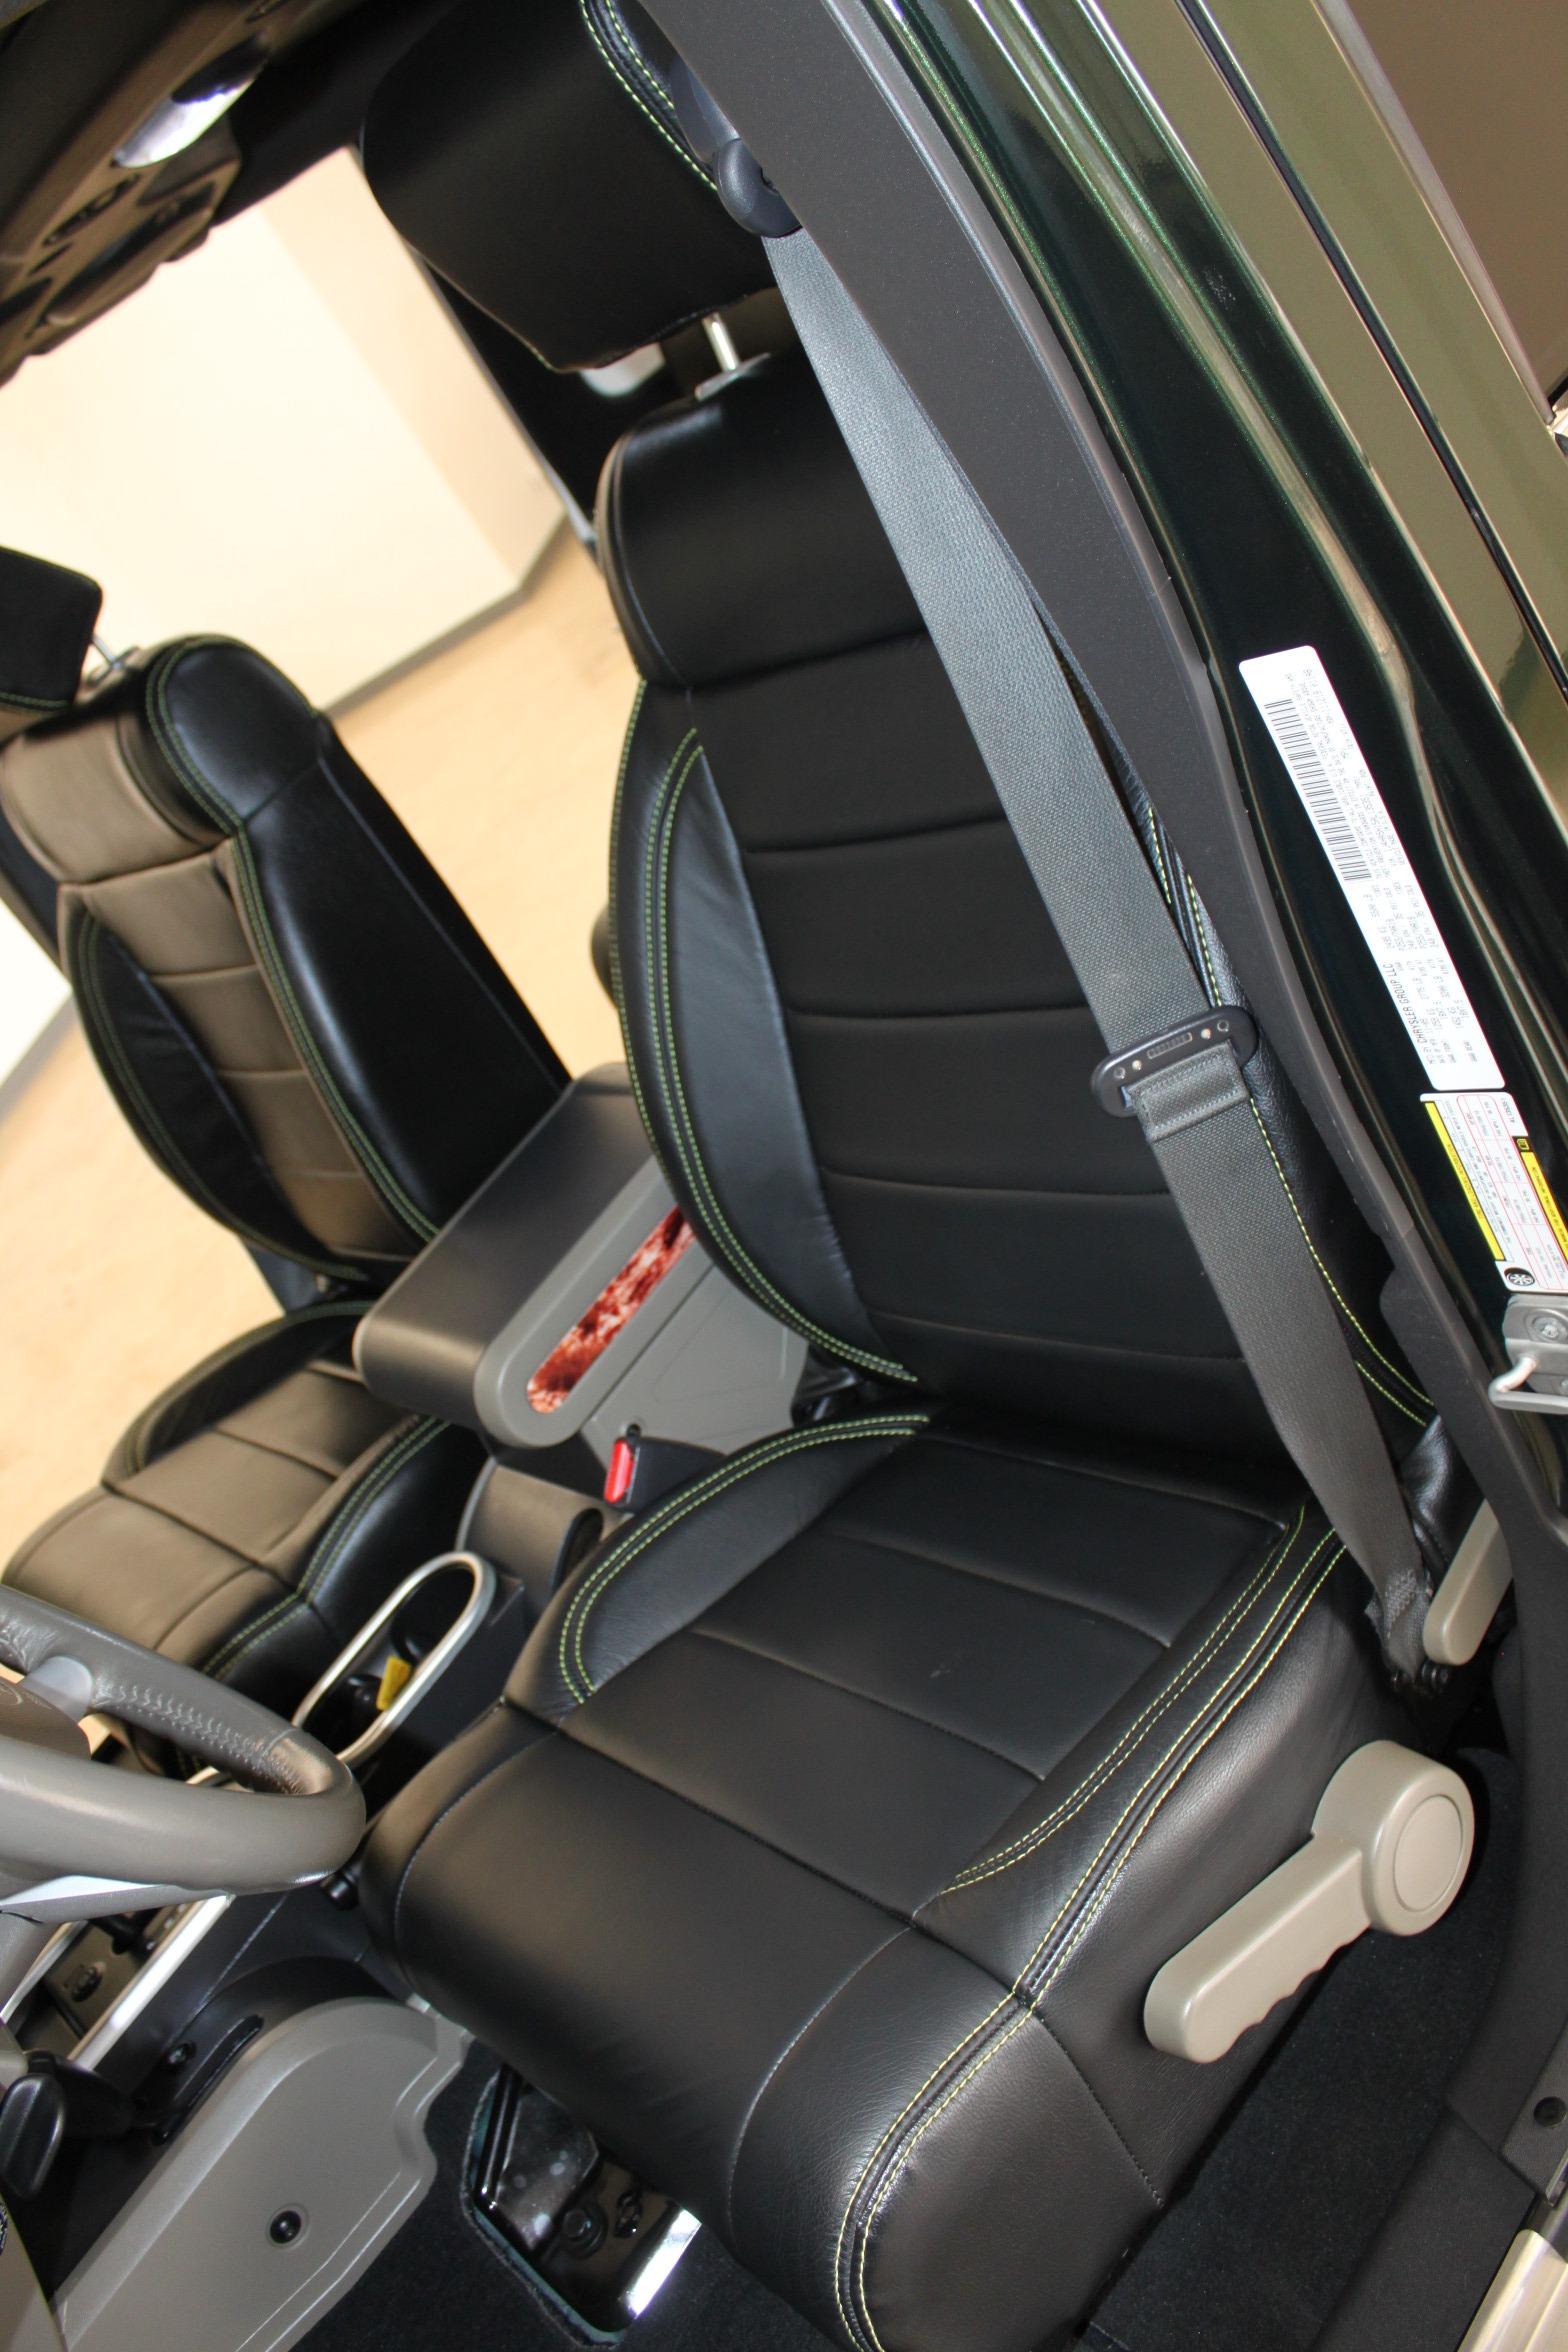 Used-2010-Jeep-Wrangler-Unlimited-Sahara-4X4-Range-Rover